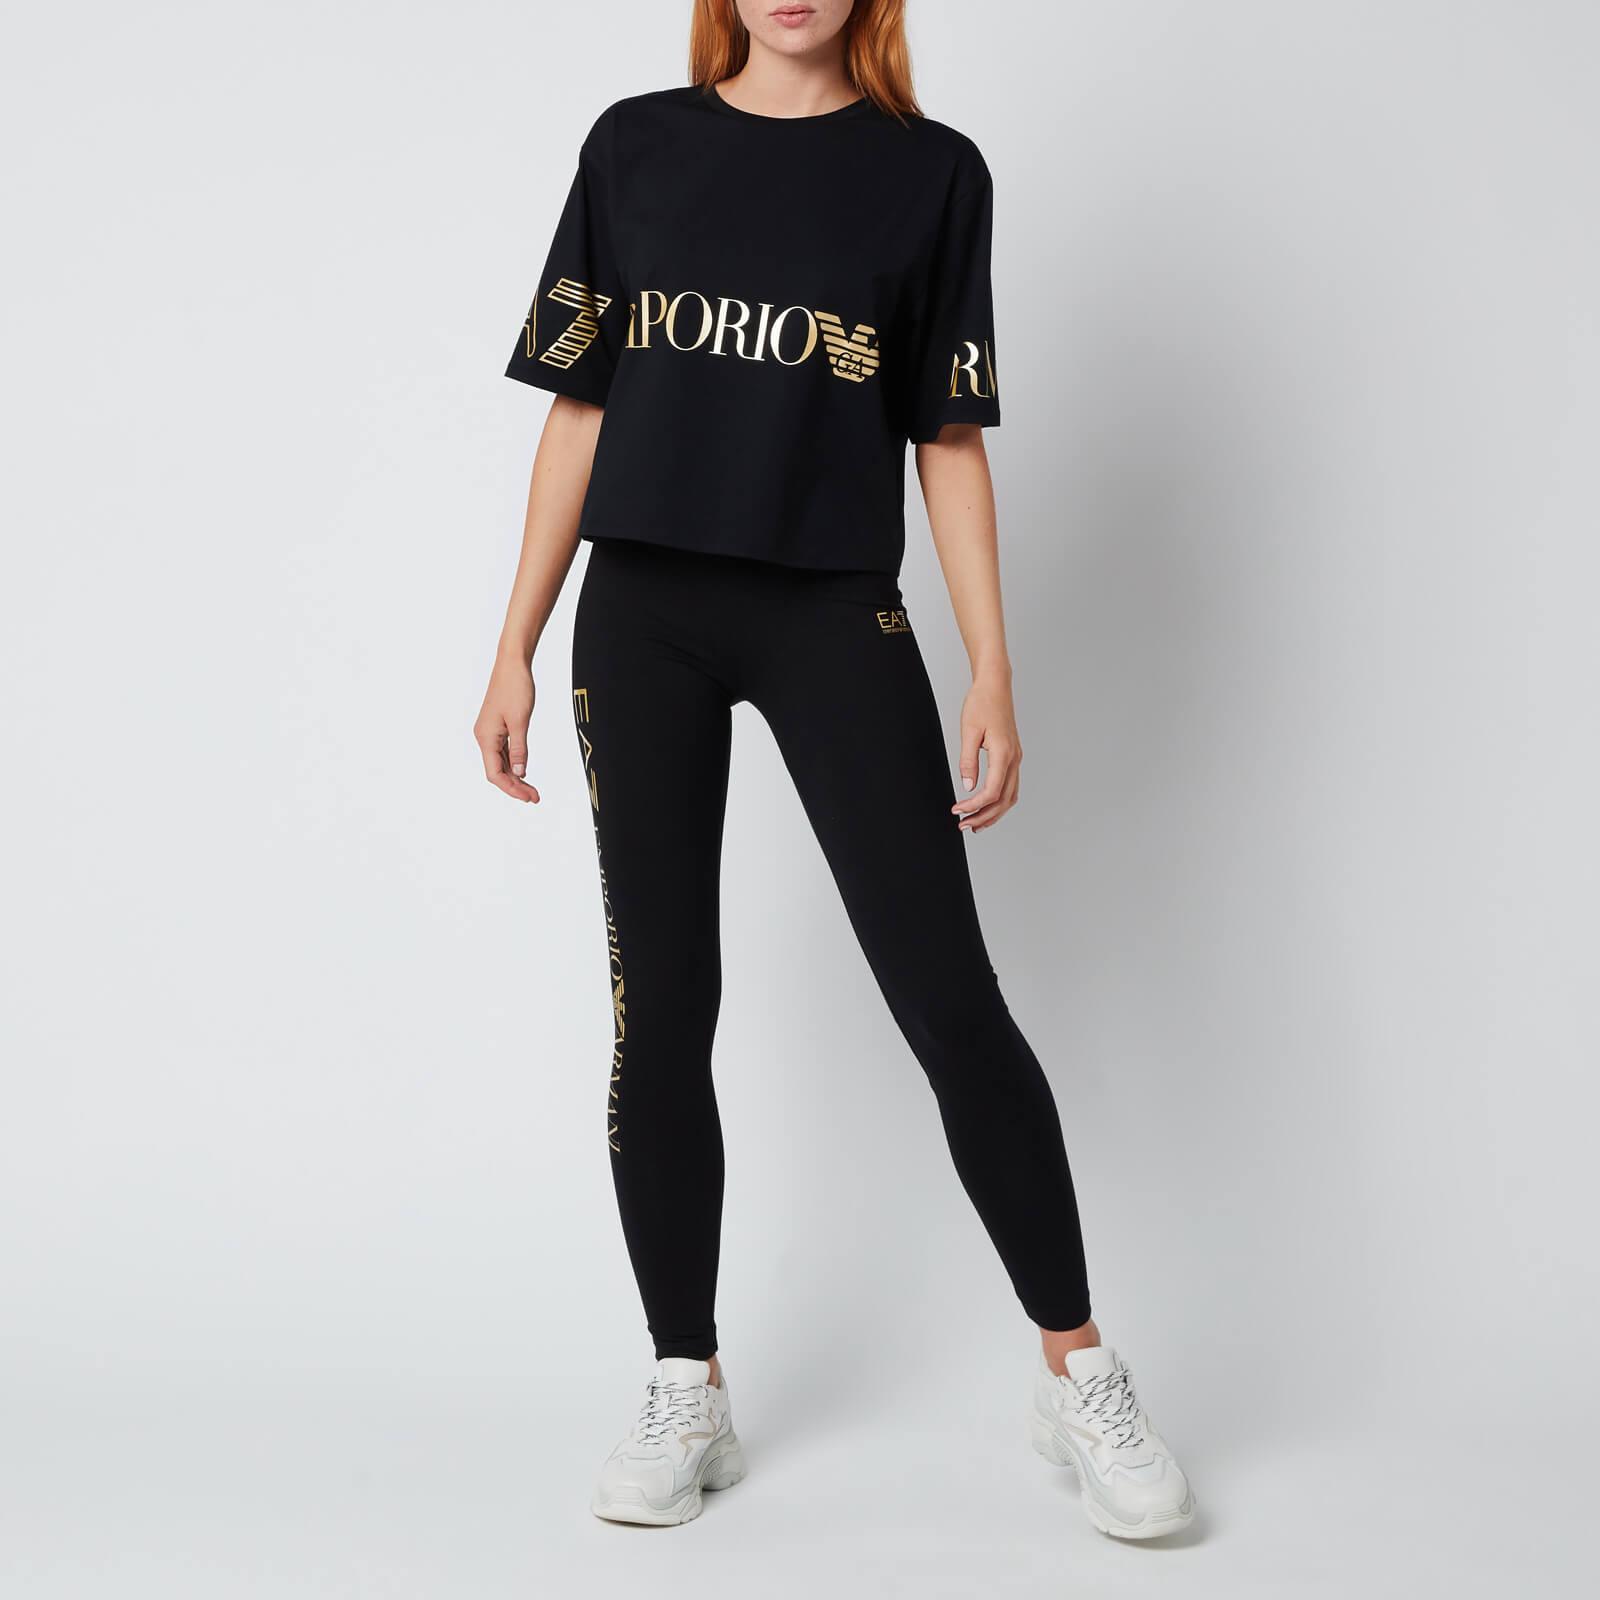 emporio armani ea7 women's train shiny leggings - black/light gold - xs